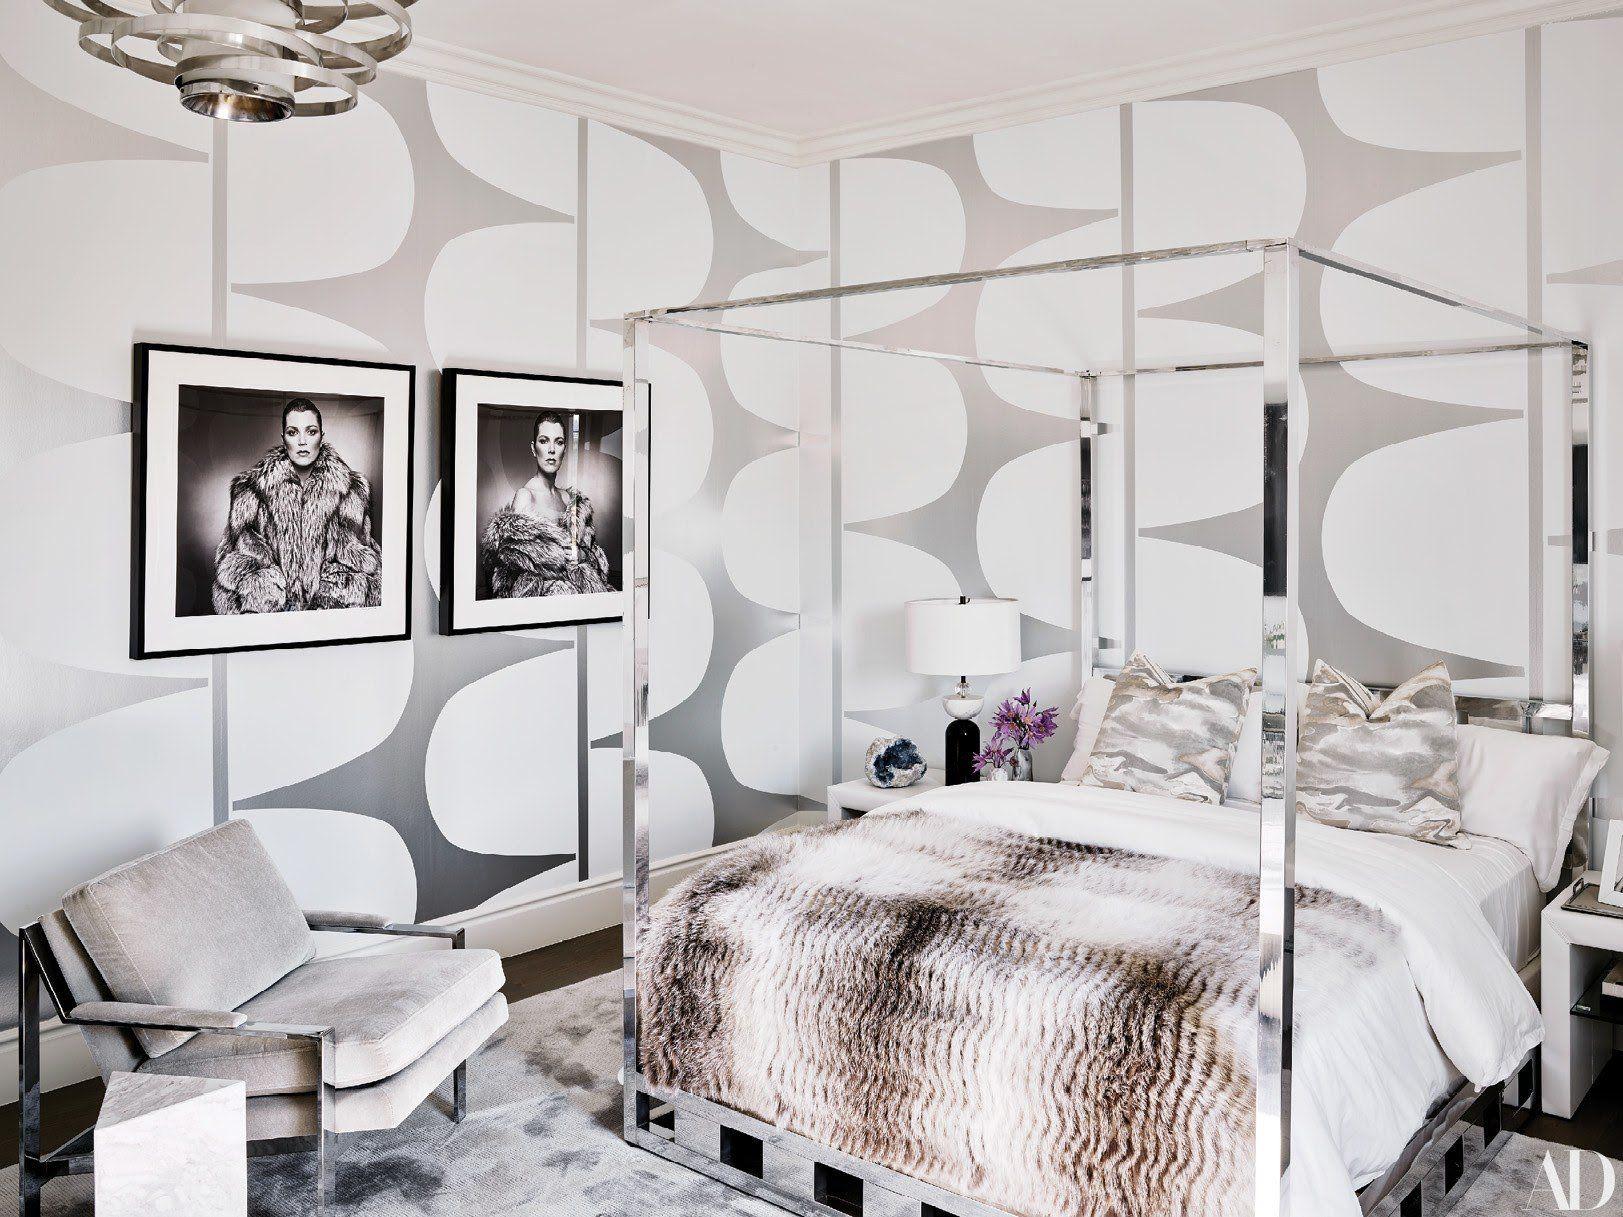 Kylie Jenner S Bedroom Jenner House Guest Bedrooms Kylie